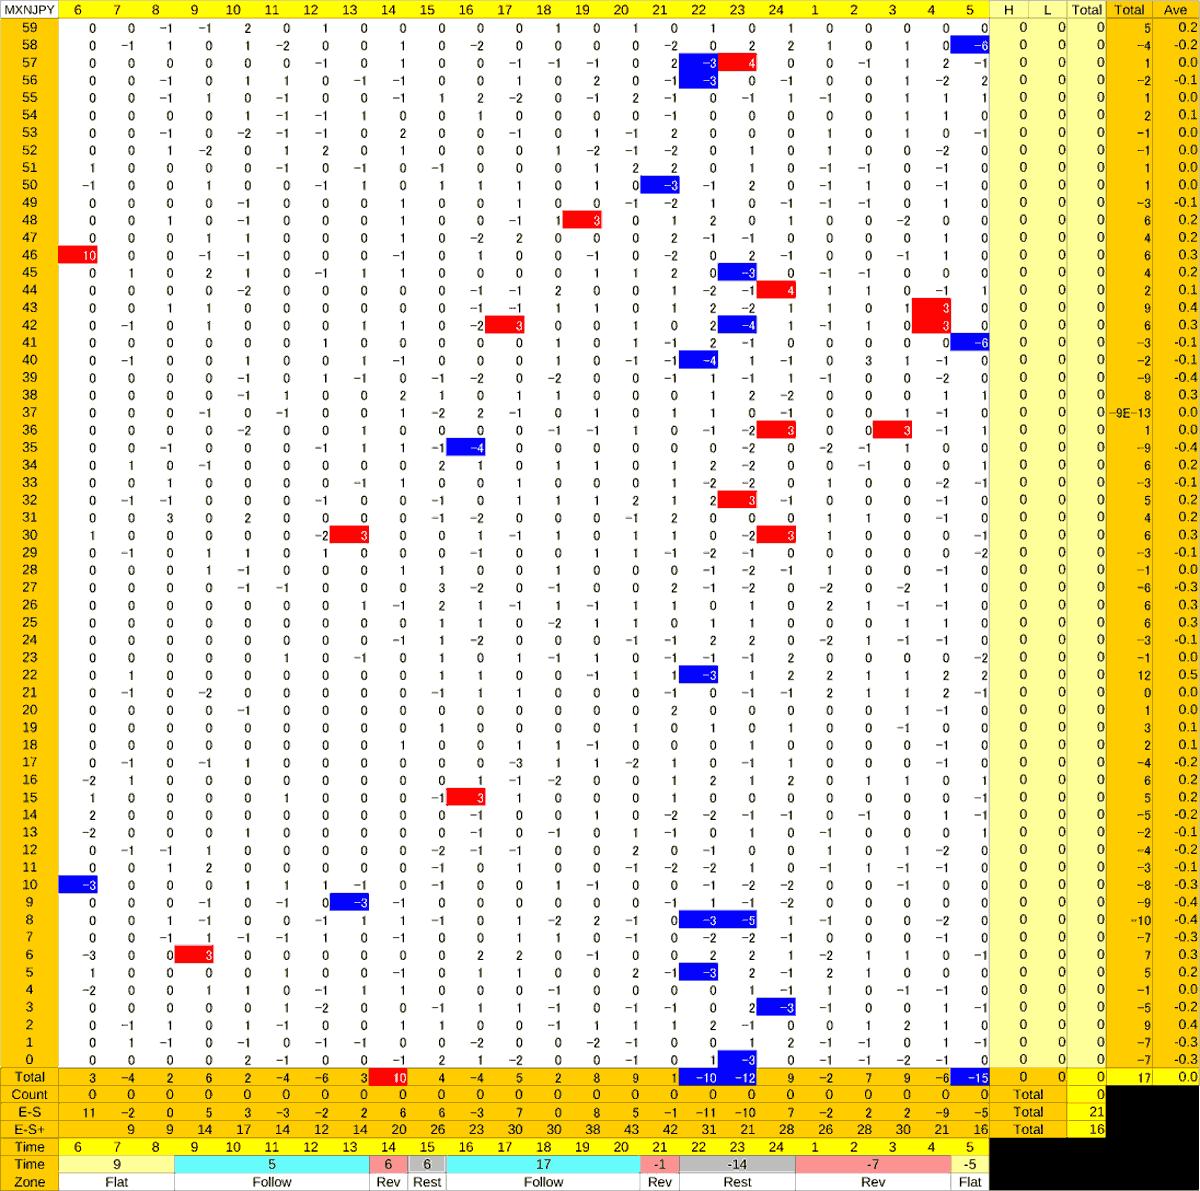 20200721_HS(3)MXNJPY